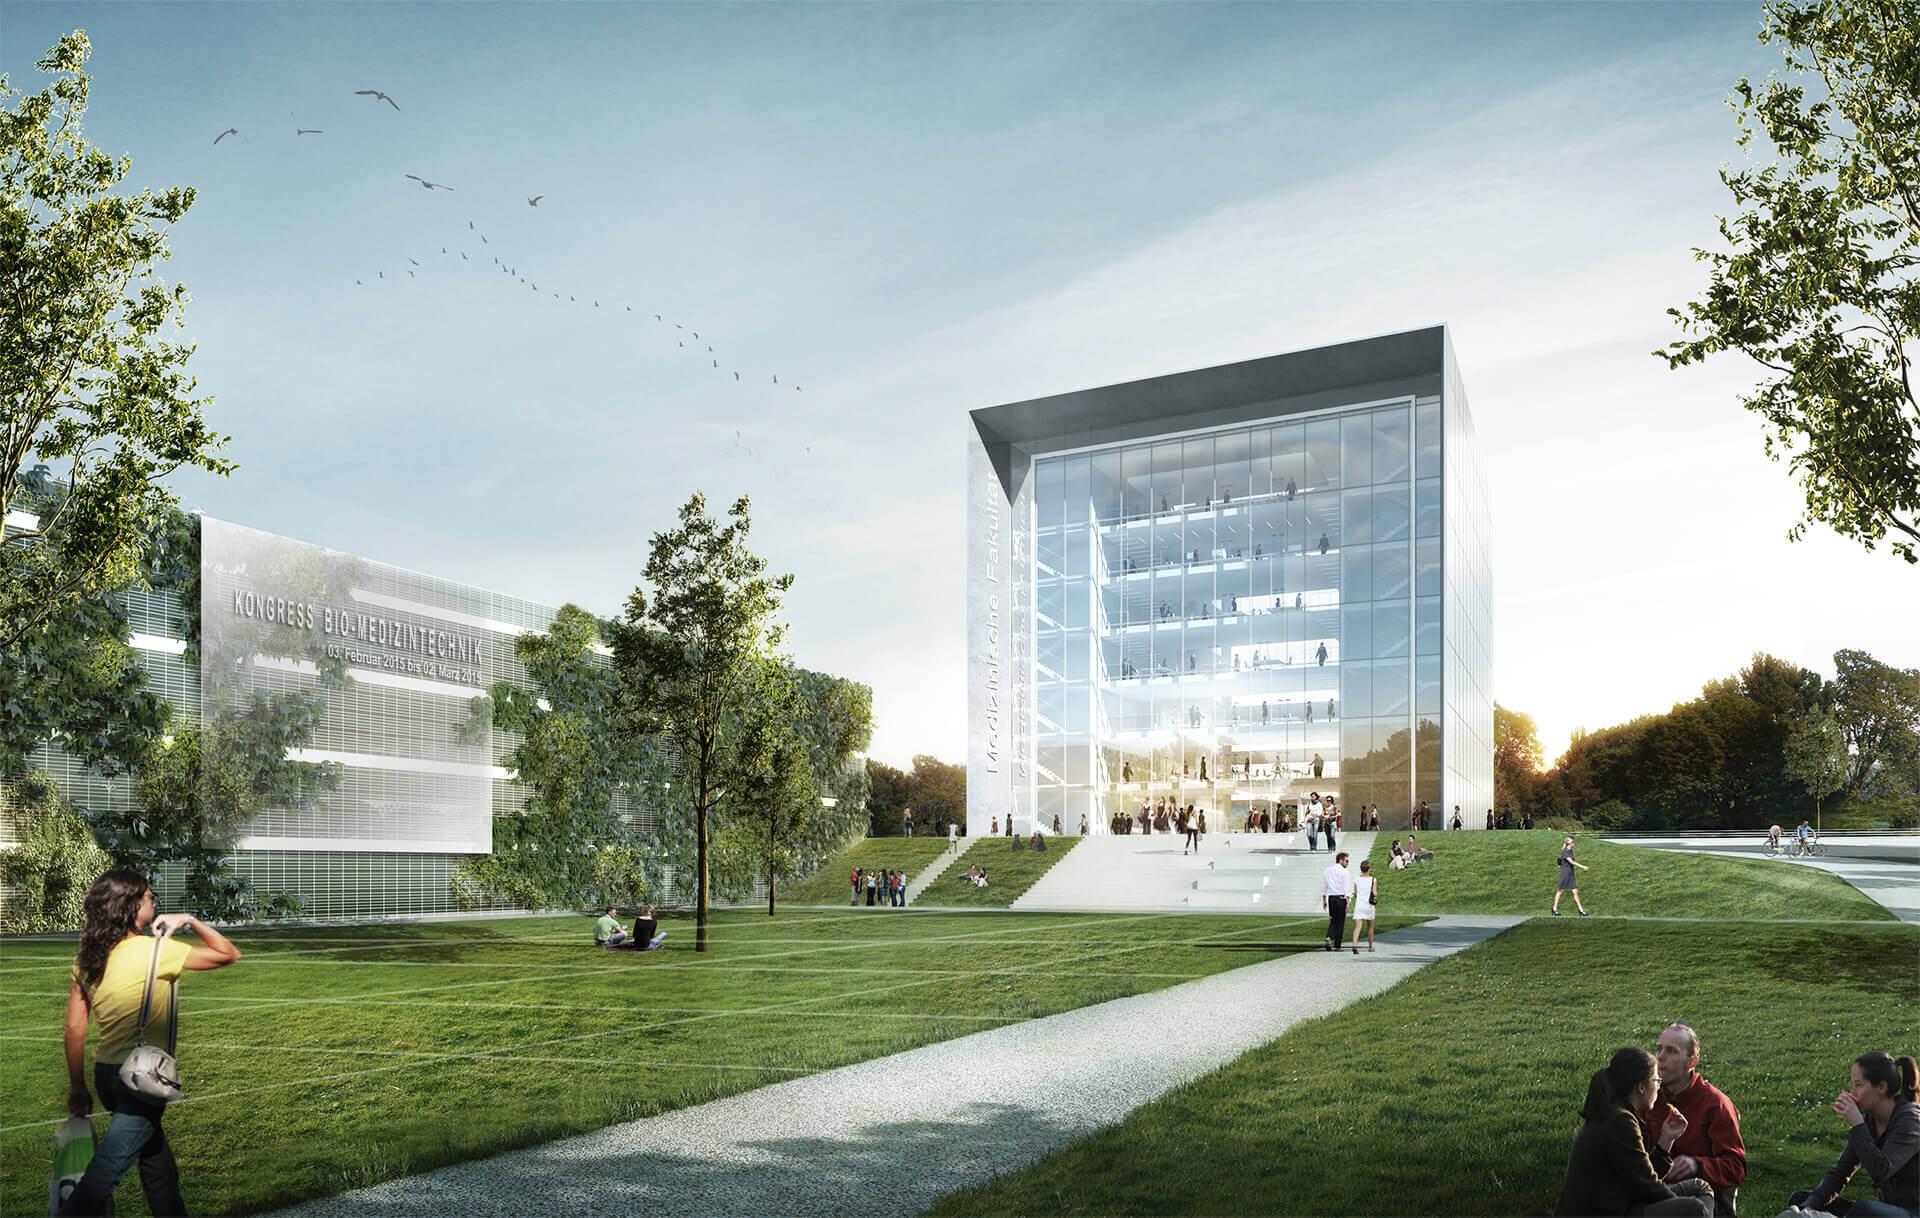 Cluster bio medizintechnik rwth sop architekten - Architekten aachen ...